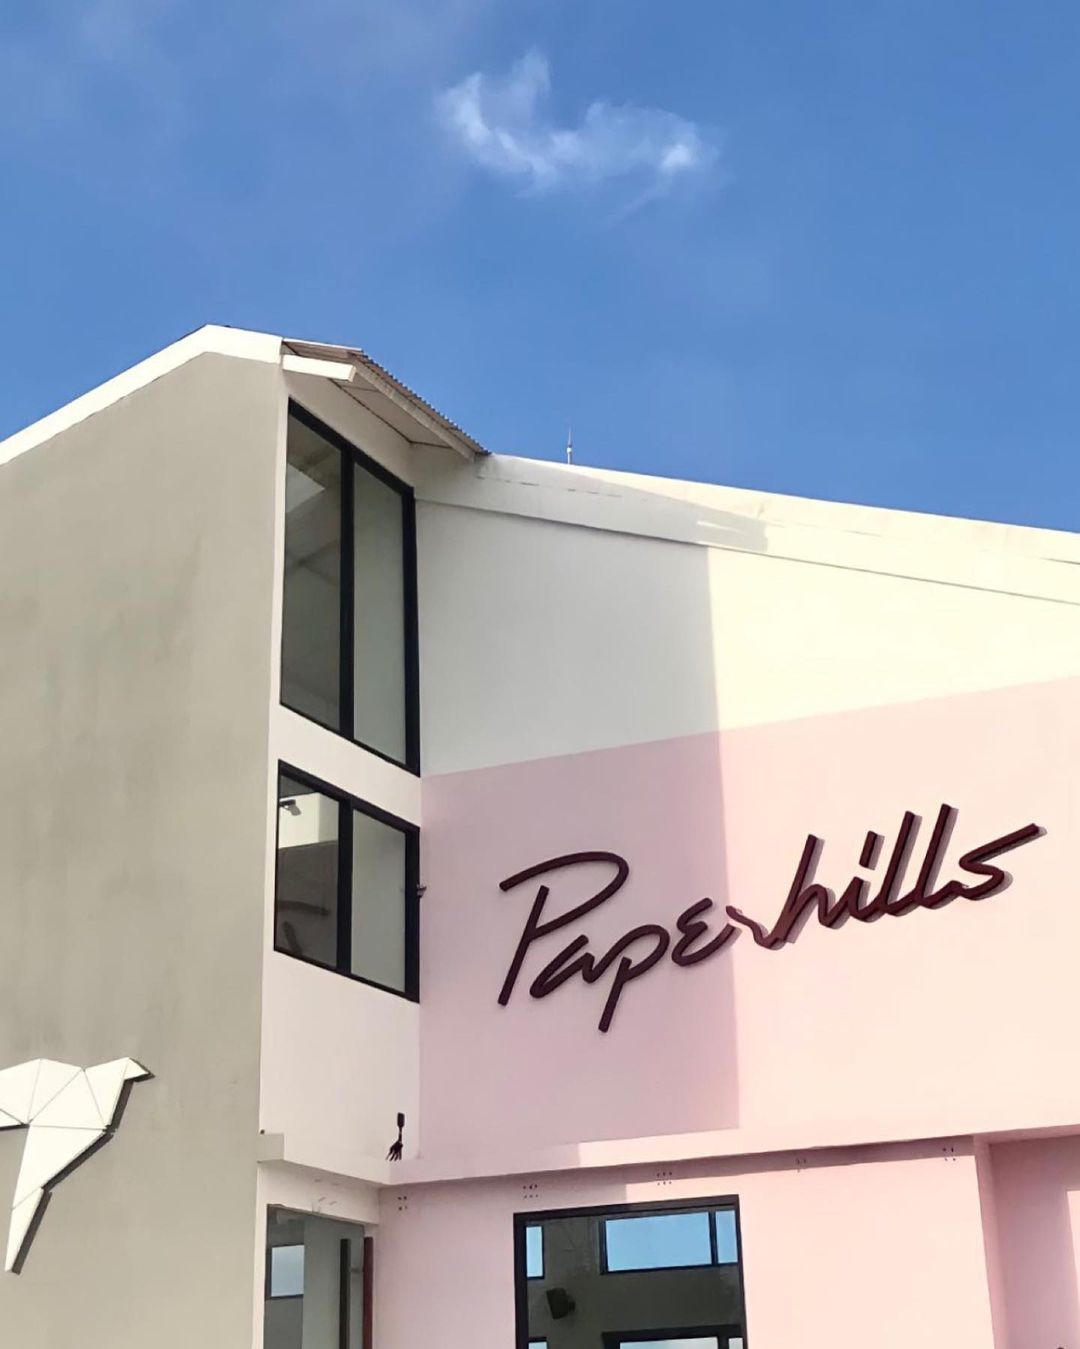 Paperhills Cafe Kintamani Image From @auliania_